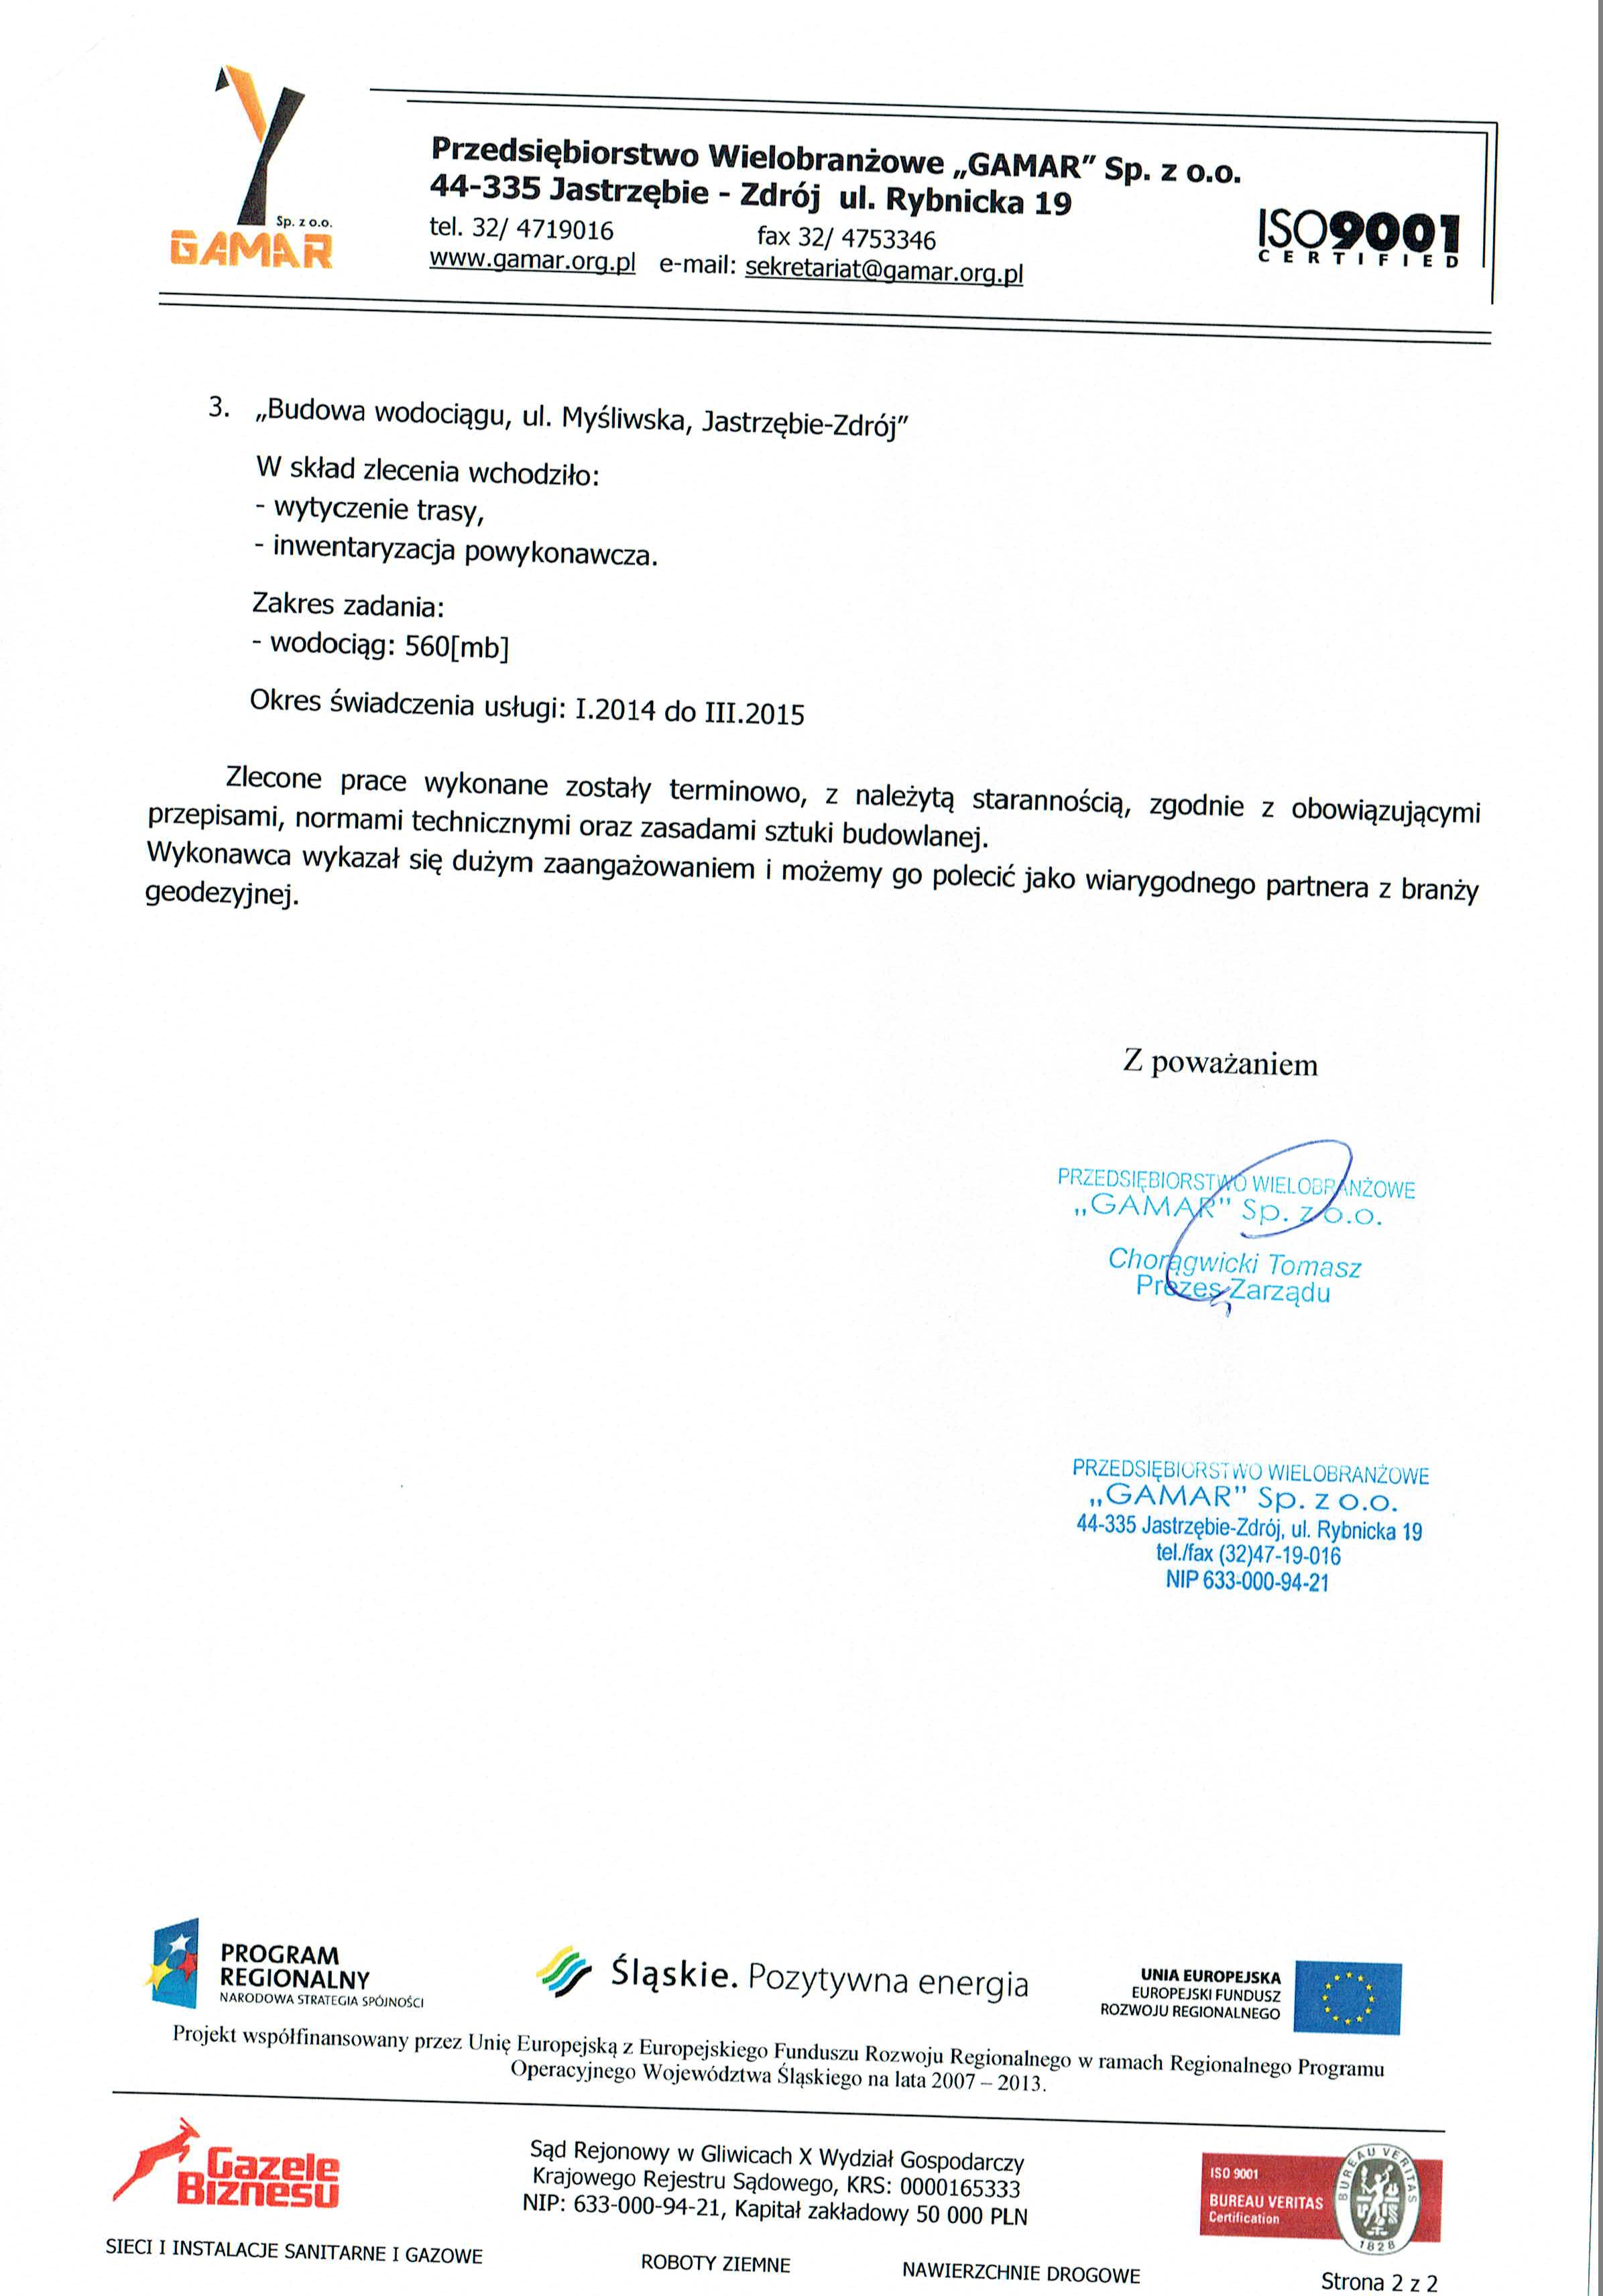 Gamar Sp. z o.o. 2